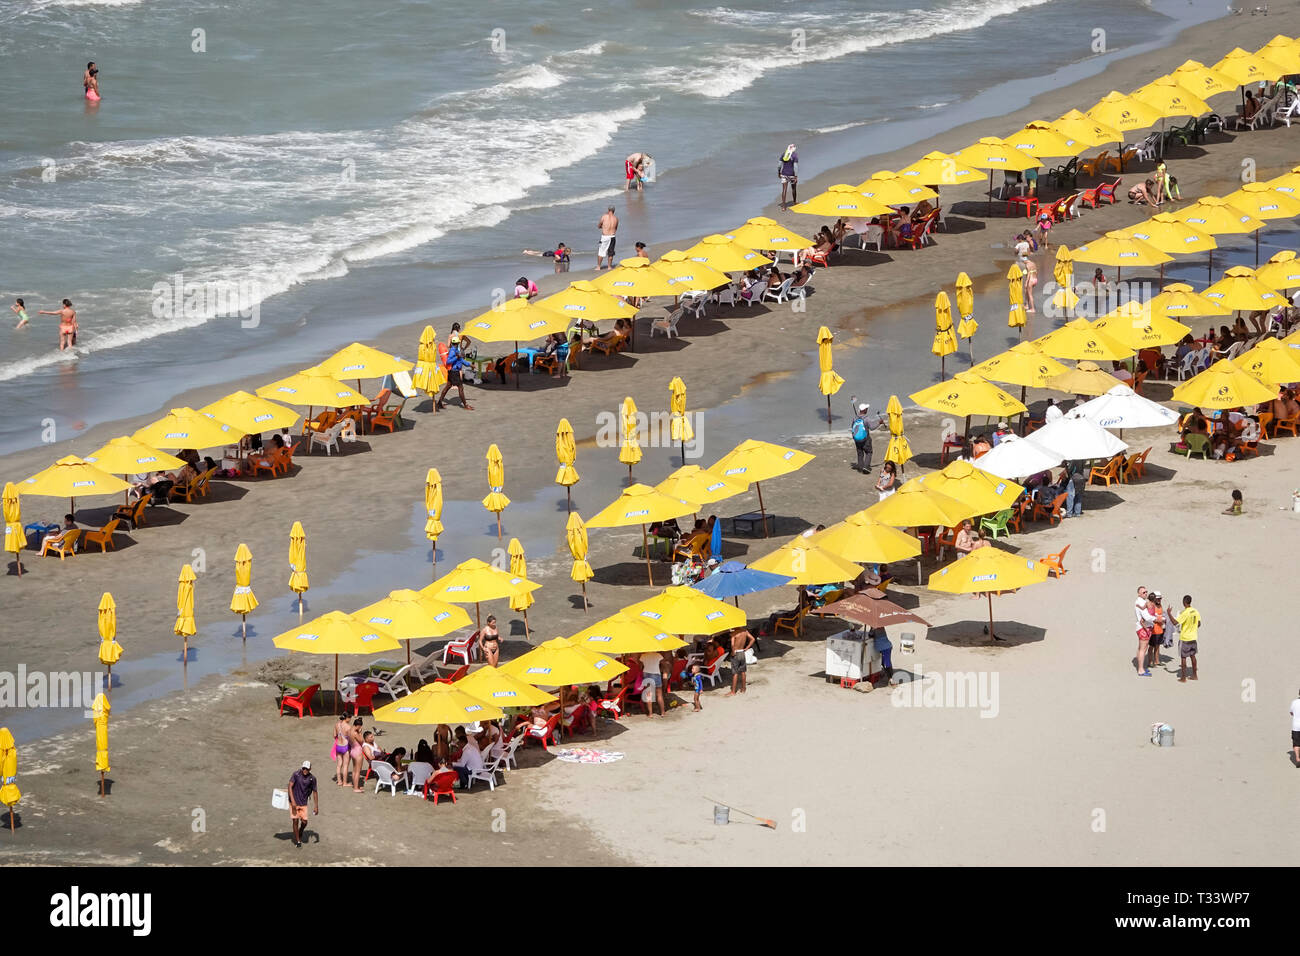 Cartagena Colombia Bocagrande Caribbean Sea public beach sand water rental umbrellas Hispanic resident residents sunbathers - Stock Image